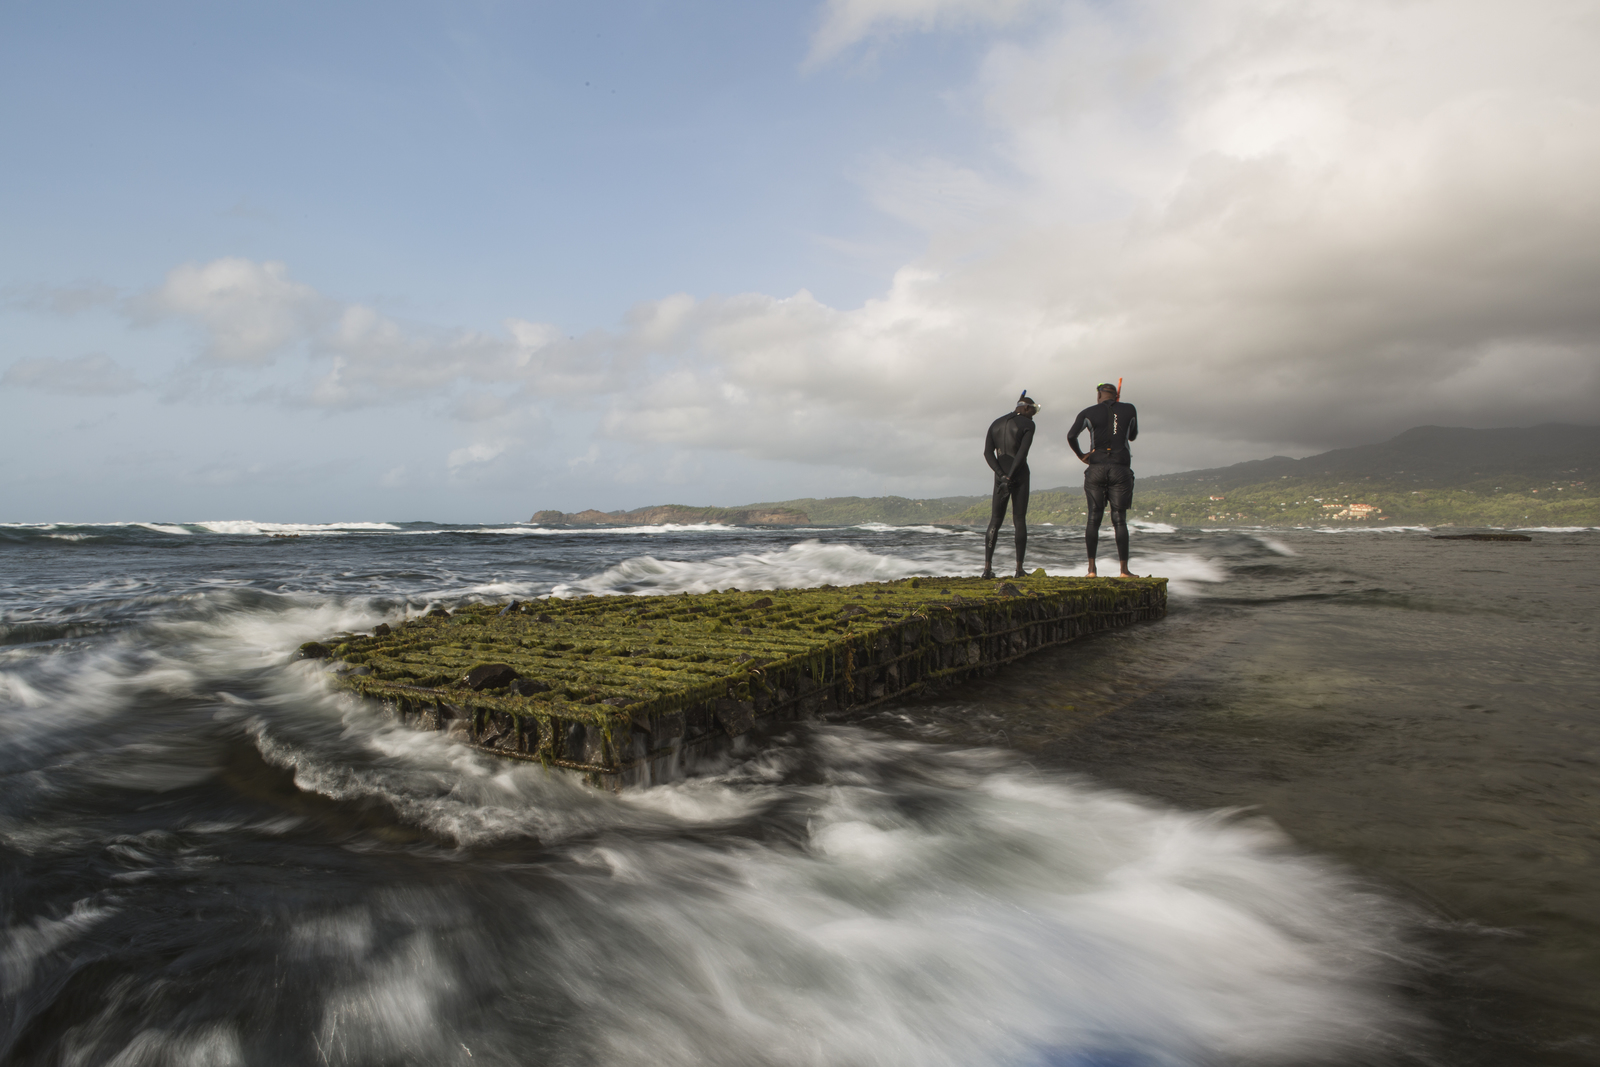 Two men stand atop an artificial reef in Grenville Bay, Grenada. Photo © Tim Calver